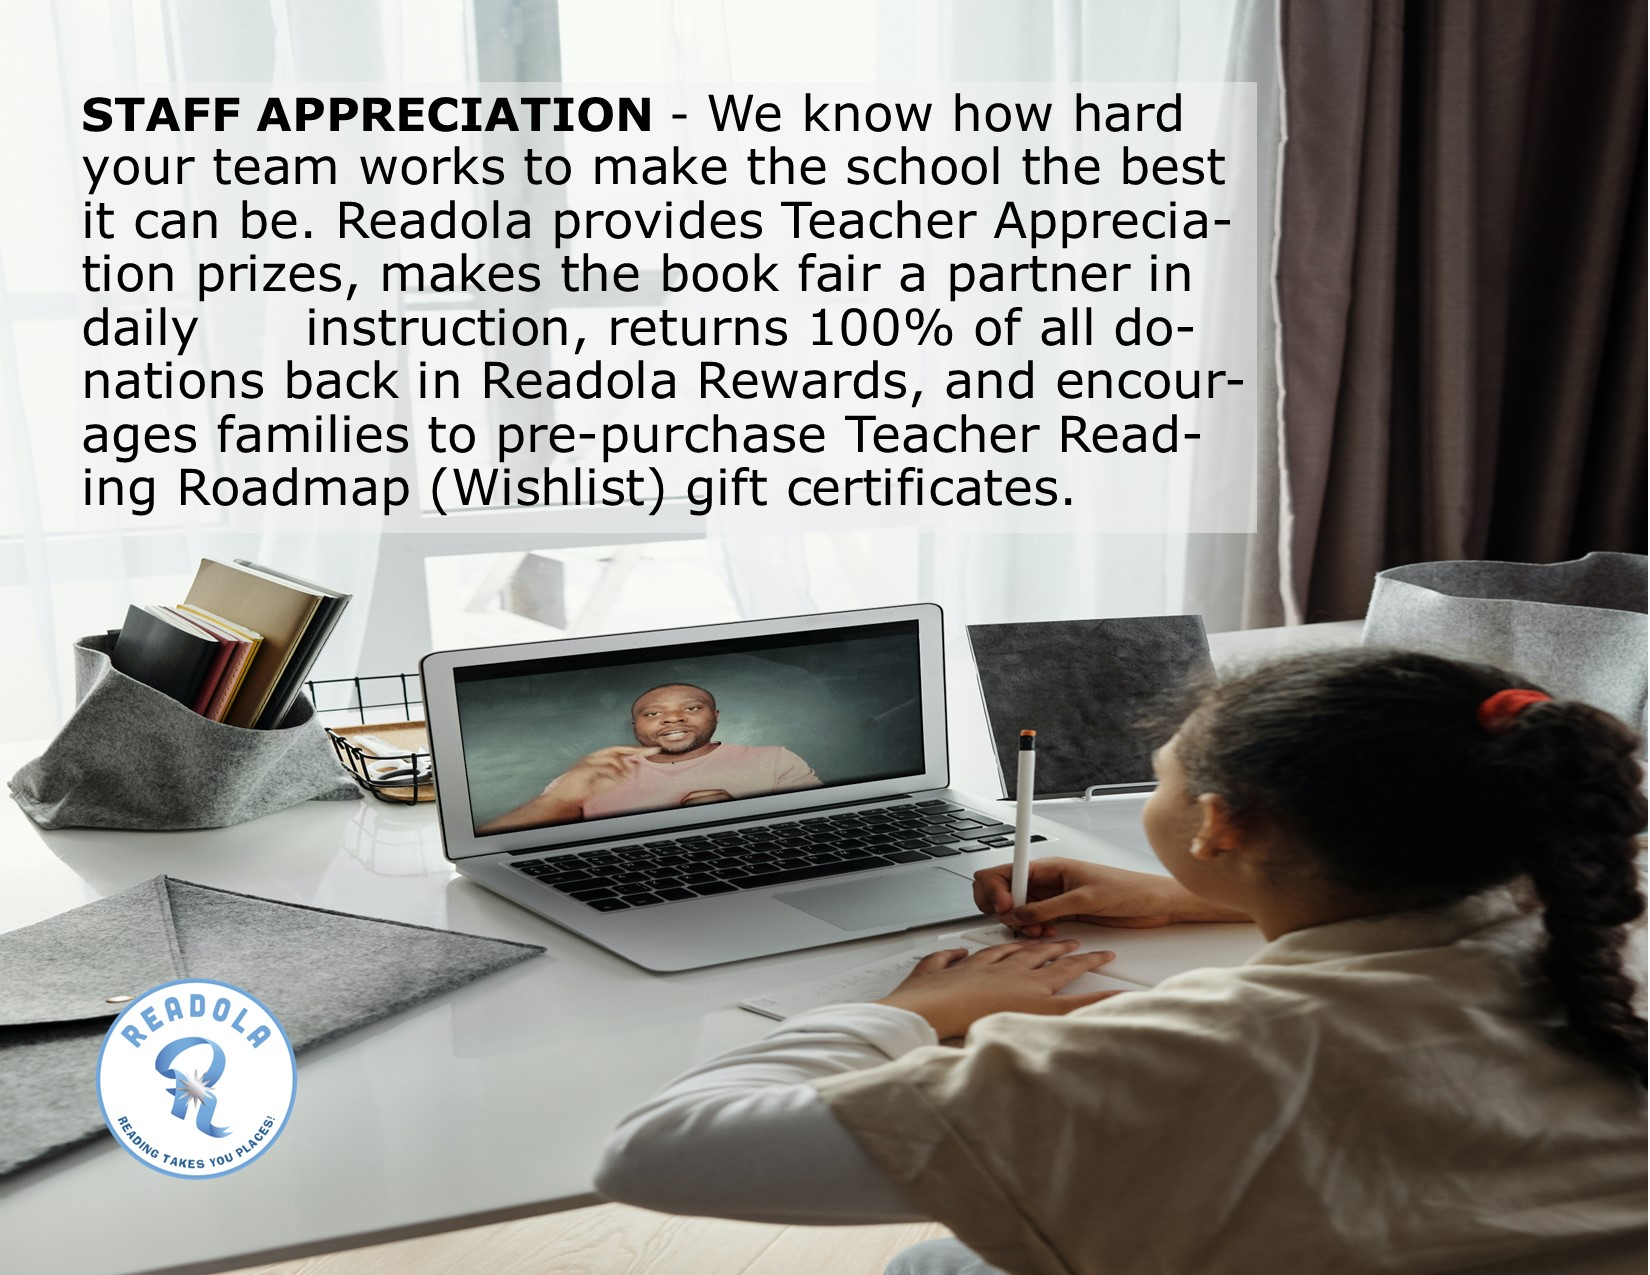 staff-appreciation.jpg